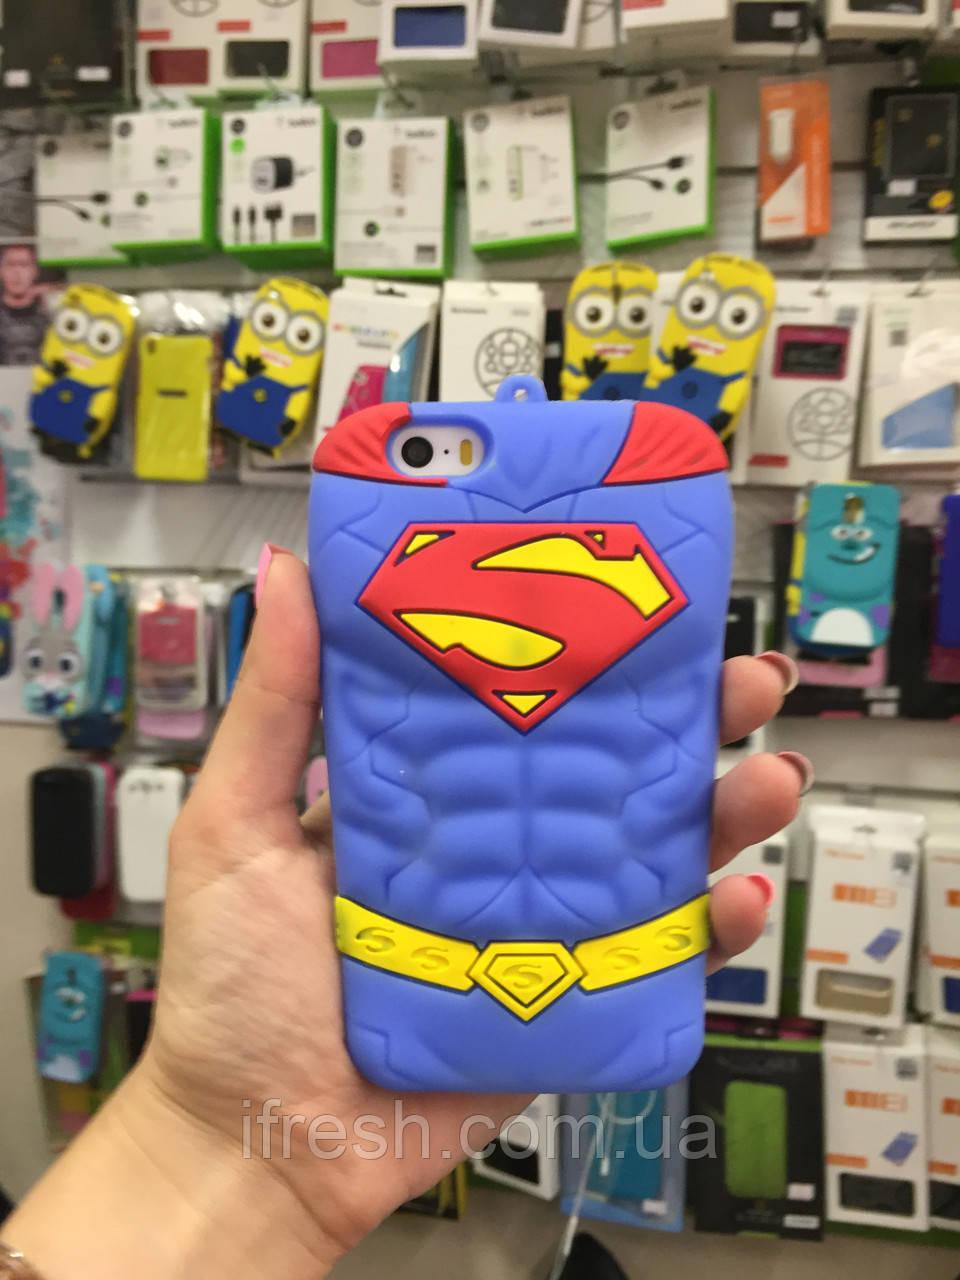 Чехол SUPERMAN для iPhone 5/5C/5S/5SE, Супермэн